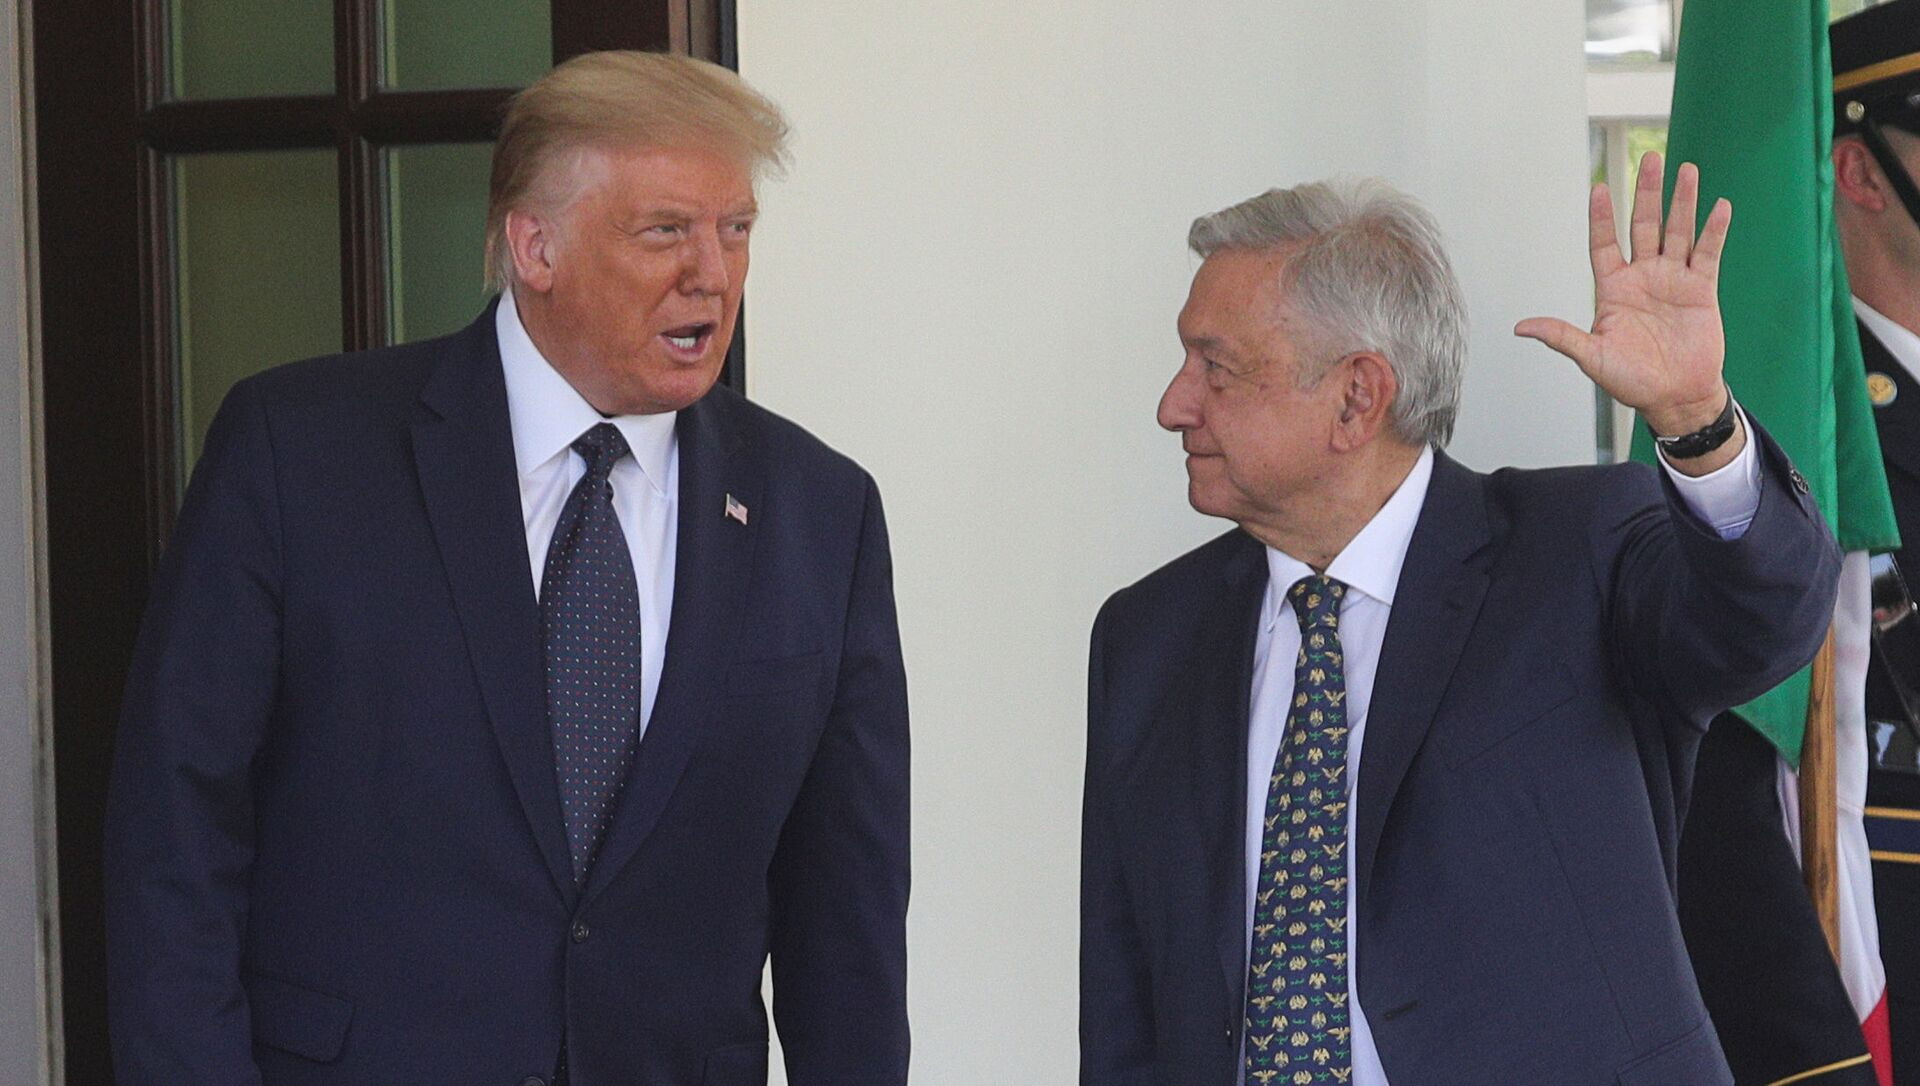 El presidente de México, Andrés Manuel López Obrador, junto a su homólogo estadounidense, Donald Trump - Sputnik Mundo, 1920, 10.07.2020